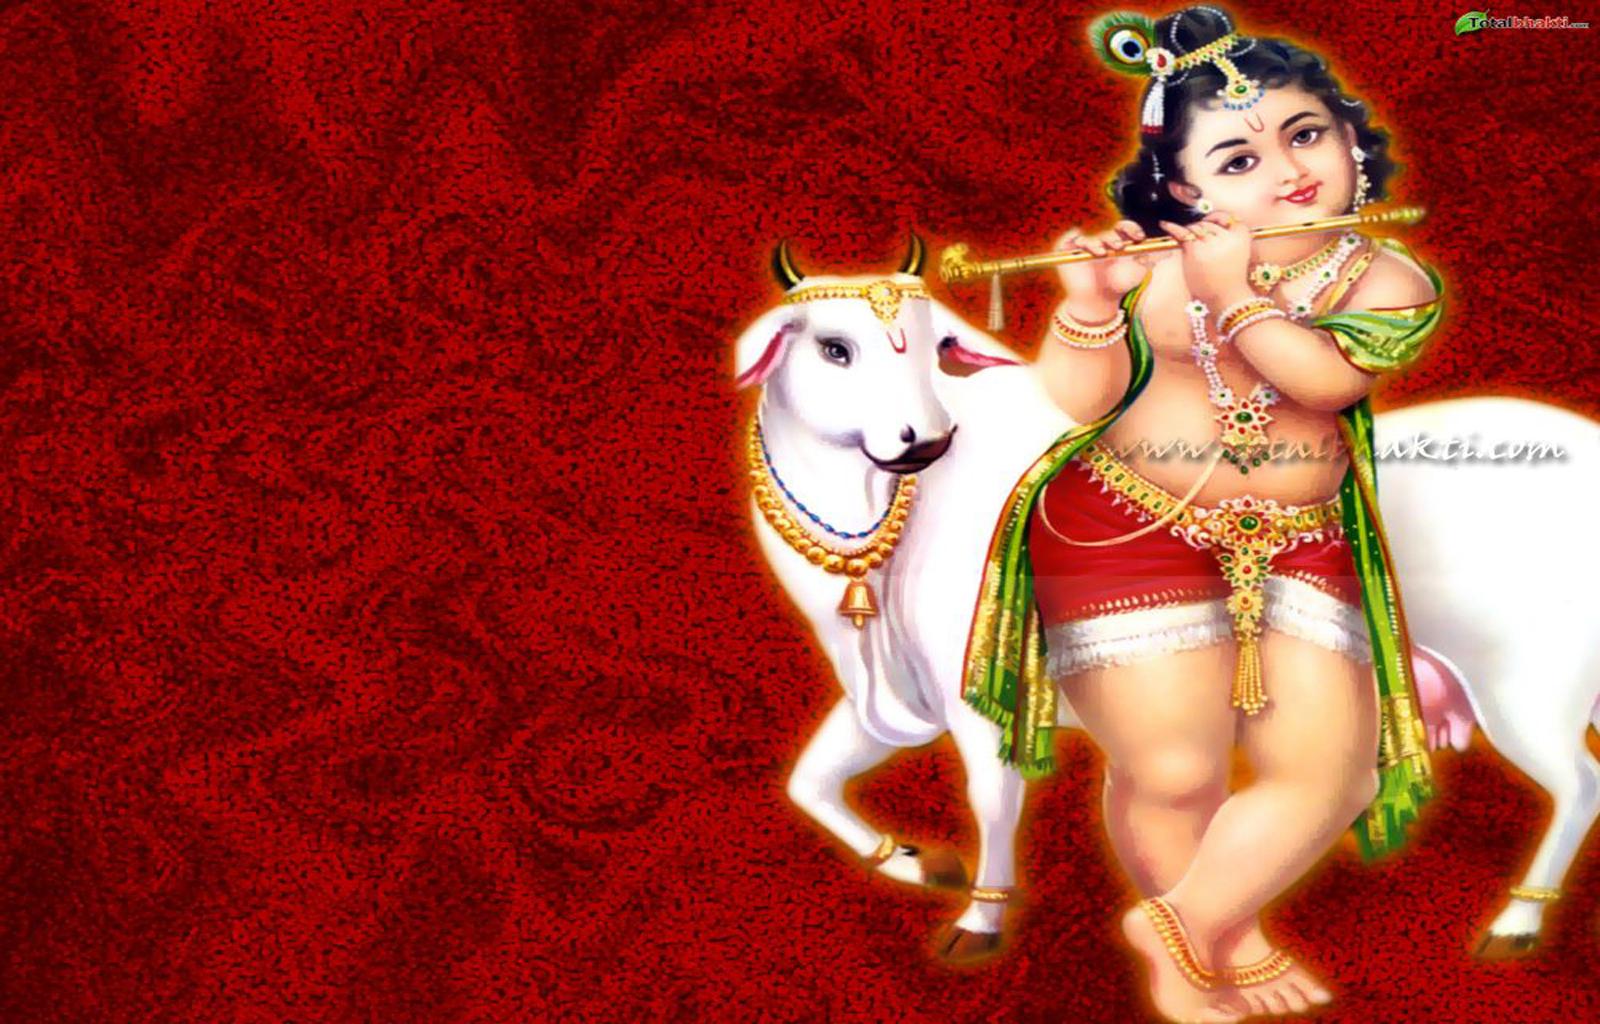 http://1.bp.blogspot.com/-xrDqd3xlWNQ/TlemRxDJGuI/AAAAAAAAAS0/hm537a6siqY/s1600/Lord-Krishna-Wallpapers-6.jpg